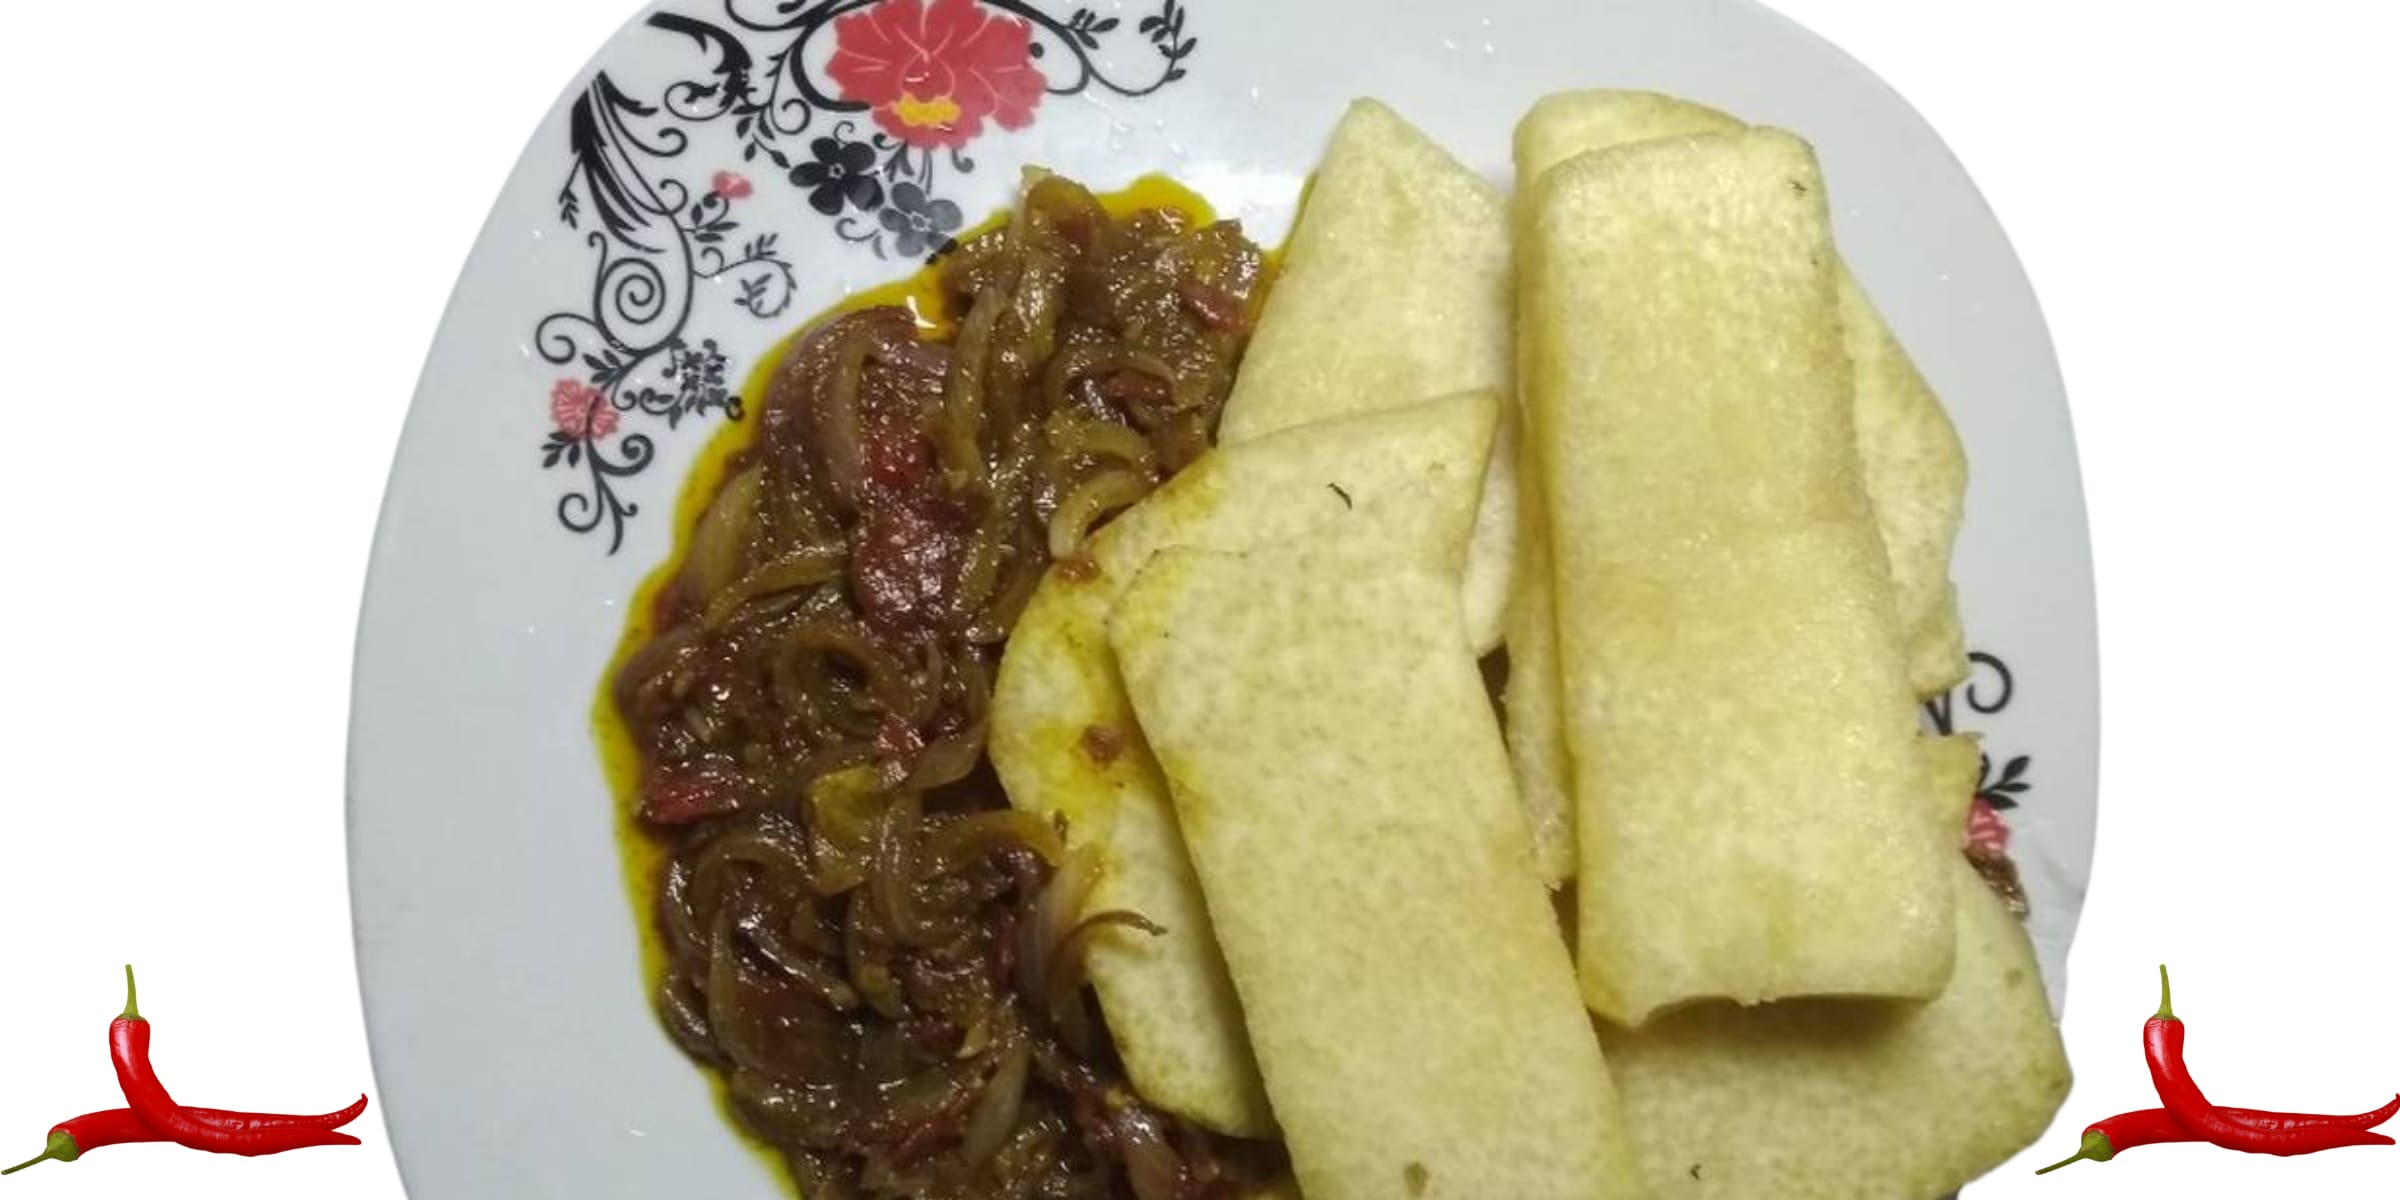 How to Make Yam and Onion Sauce